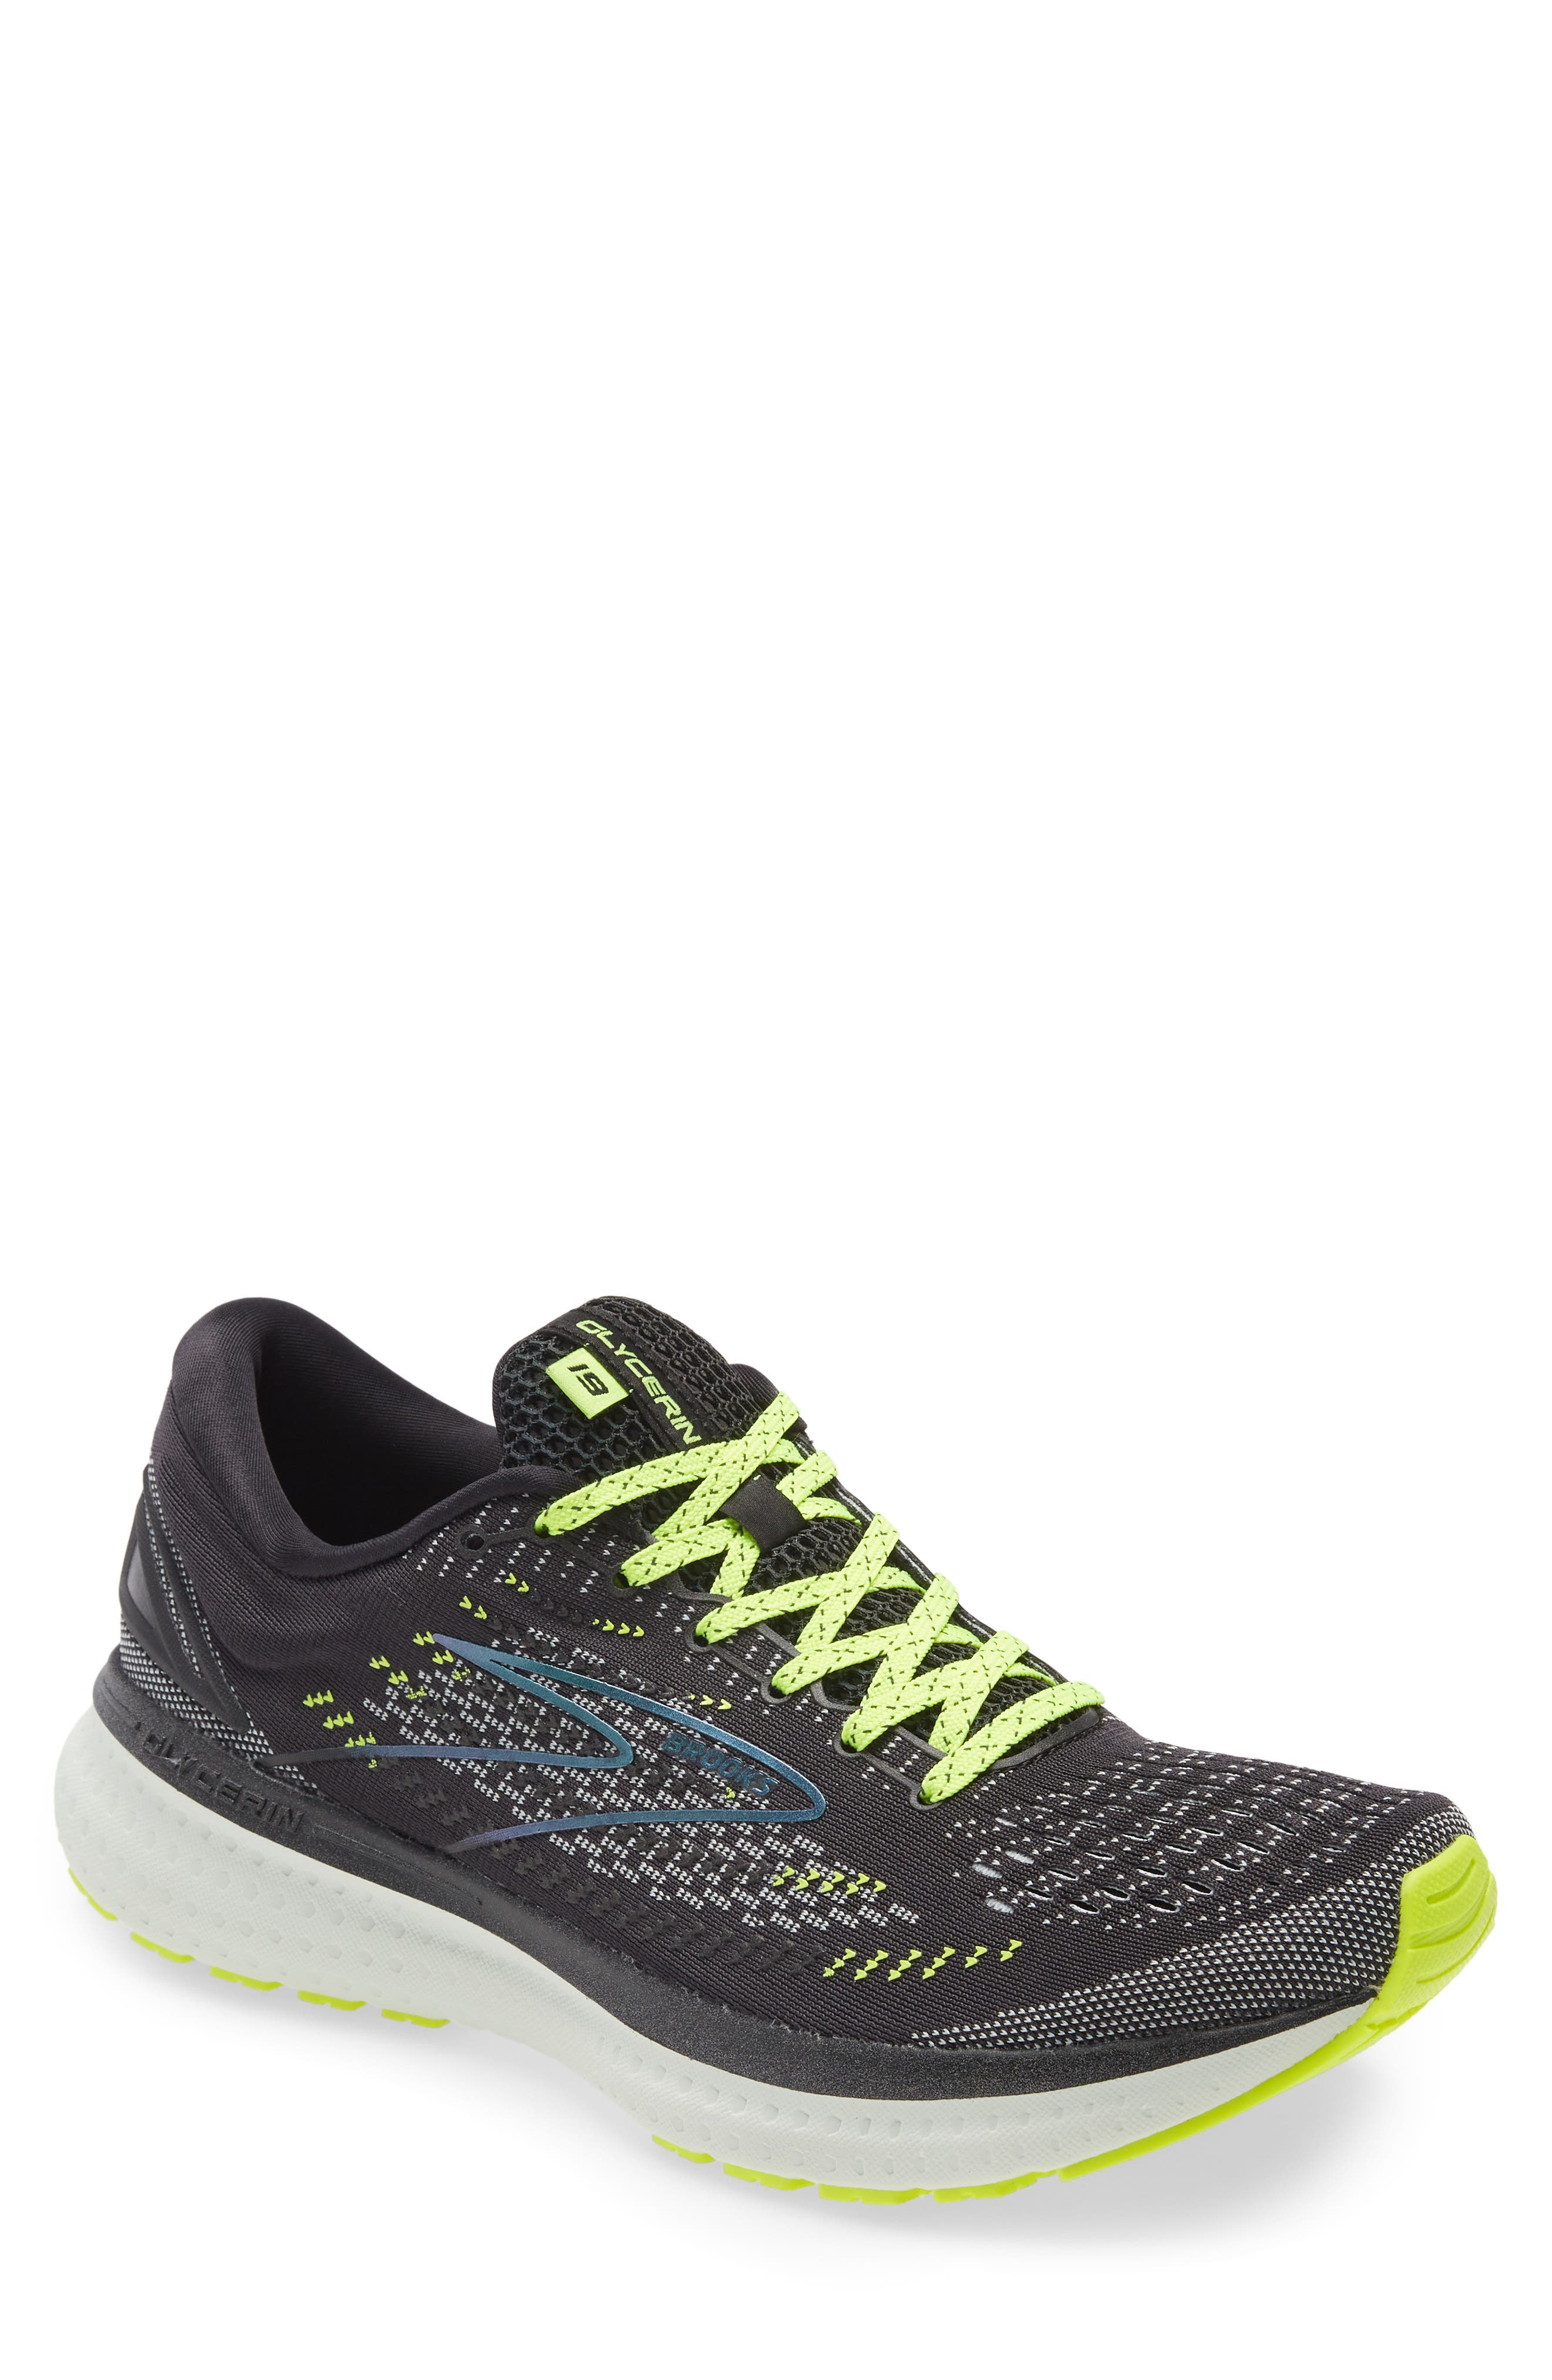 Glycerin 19 Running Shoe